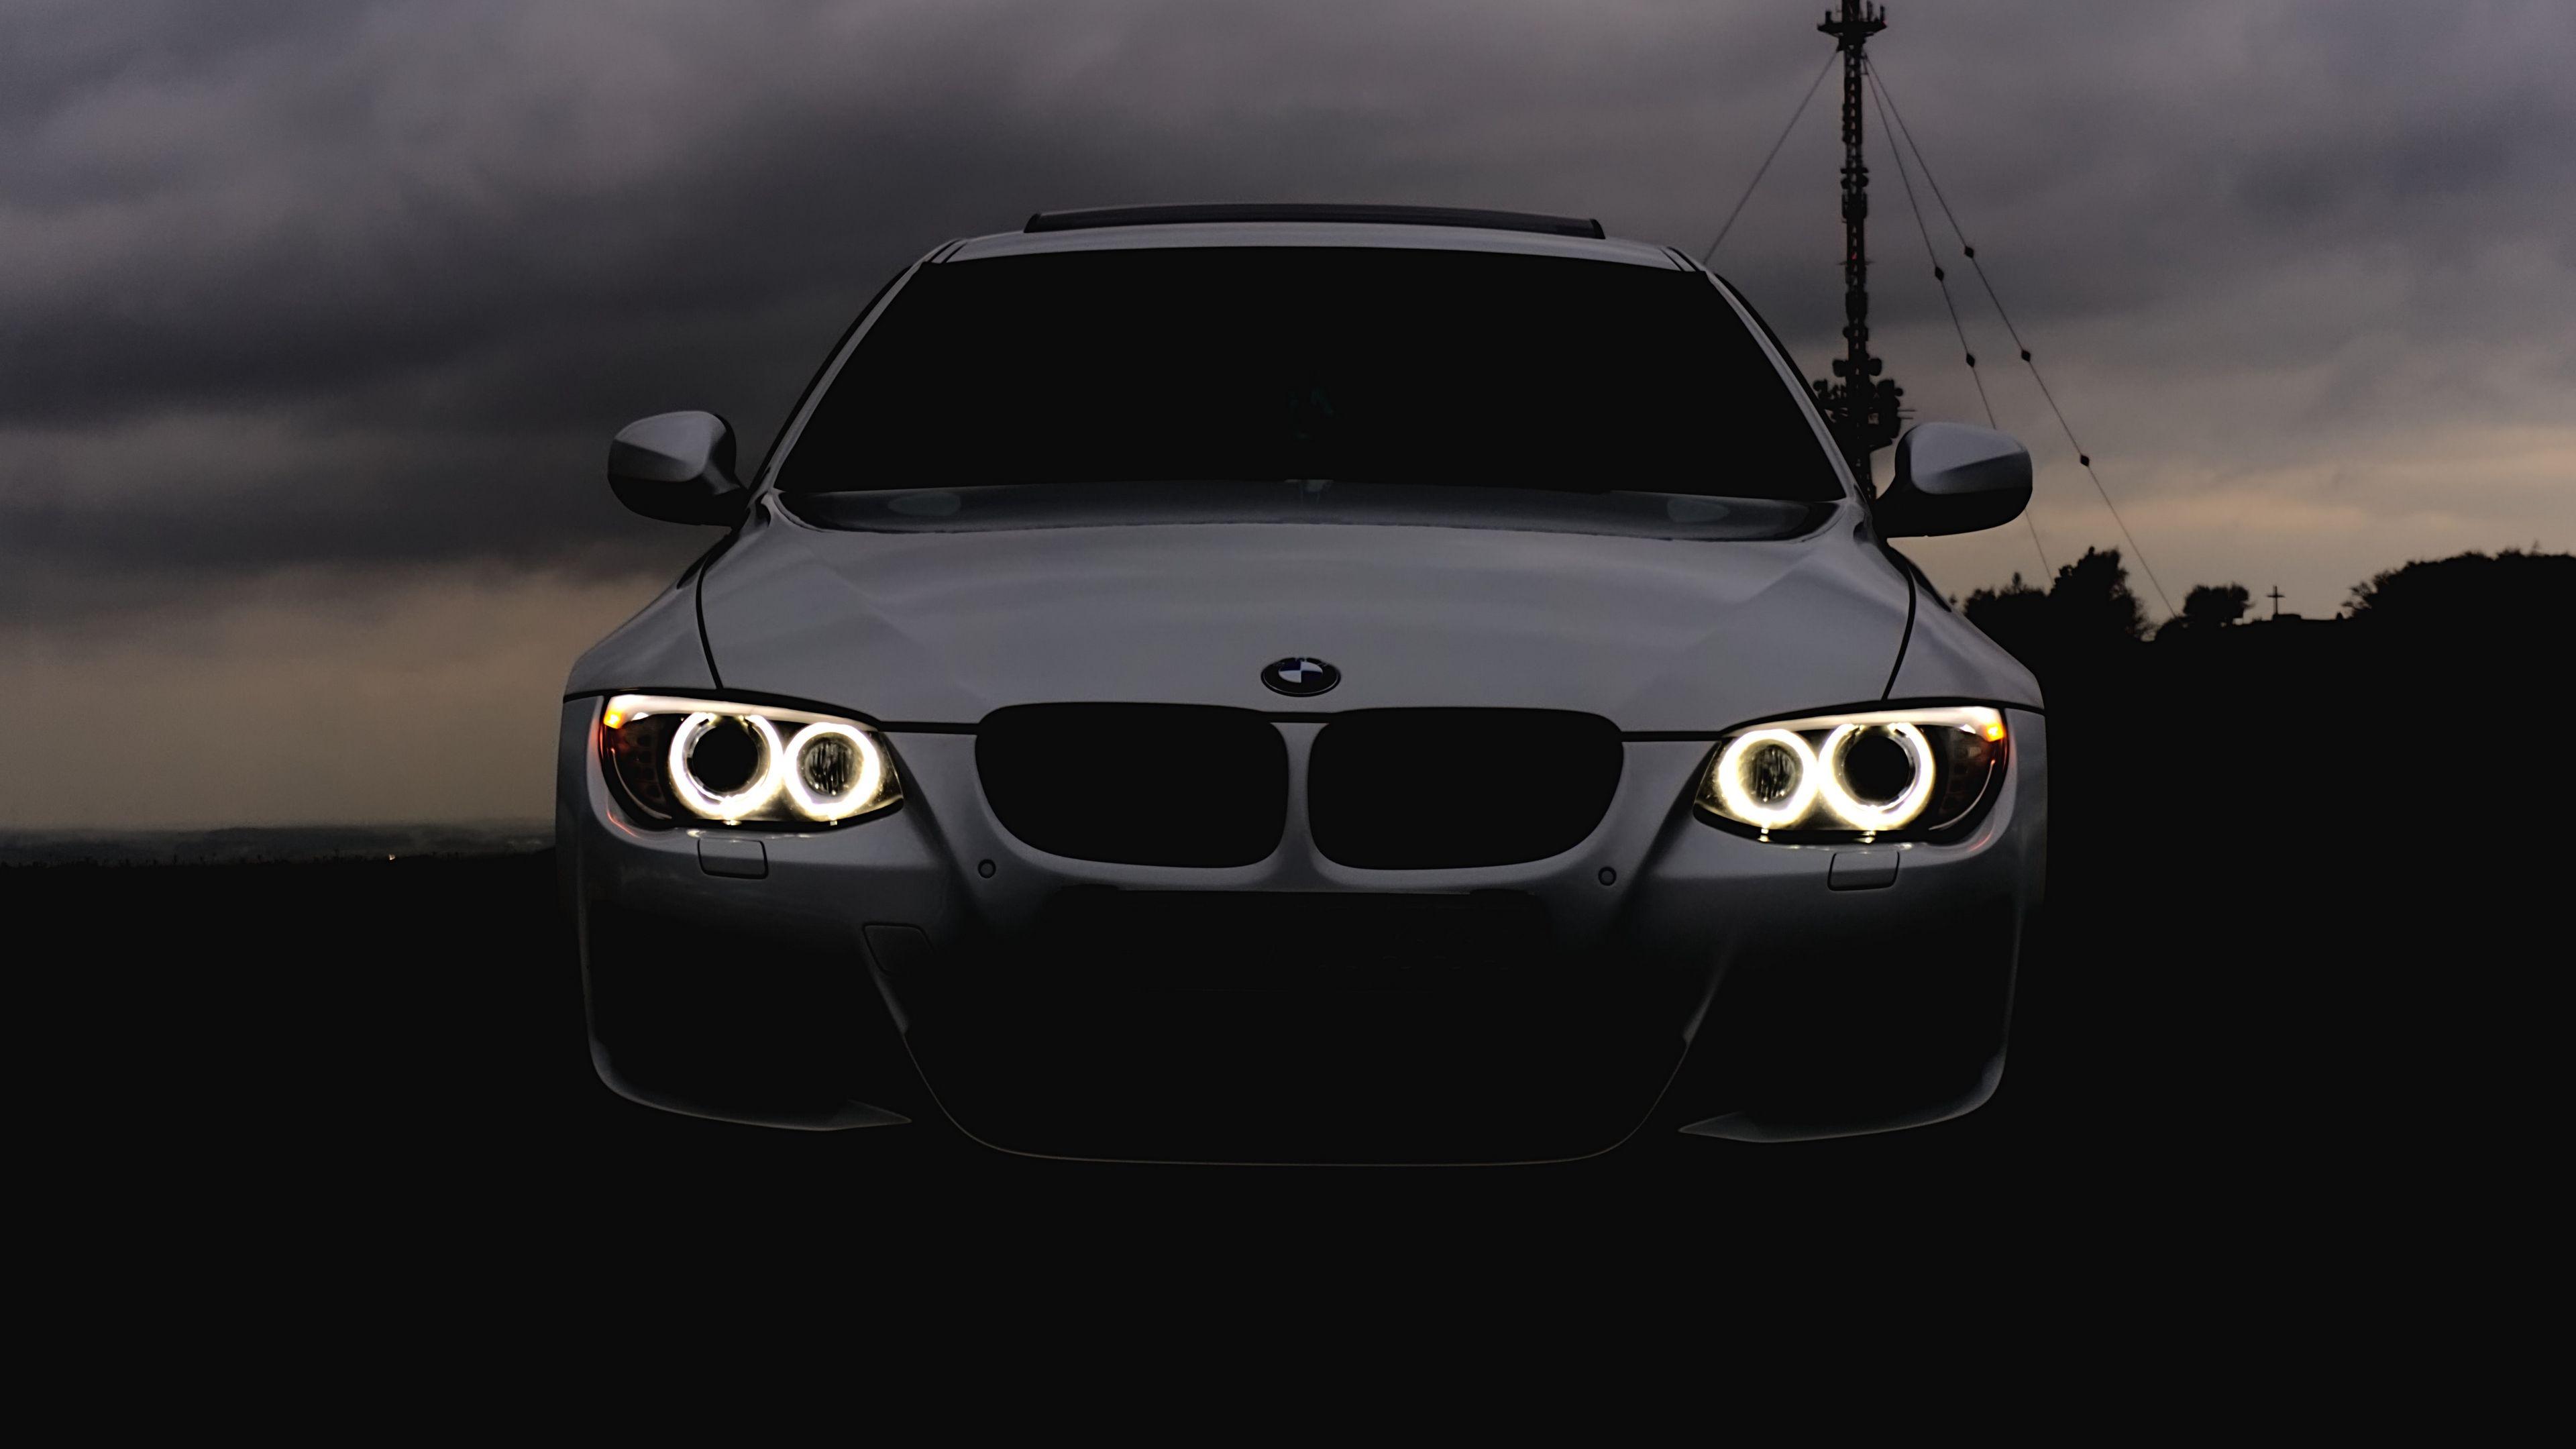 Bmw Headlights Car Cloudy Overcast 4k Headlights Car Bmw Jaguar Car Car Hd Bmw